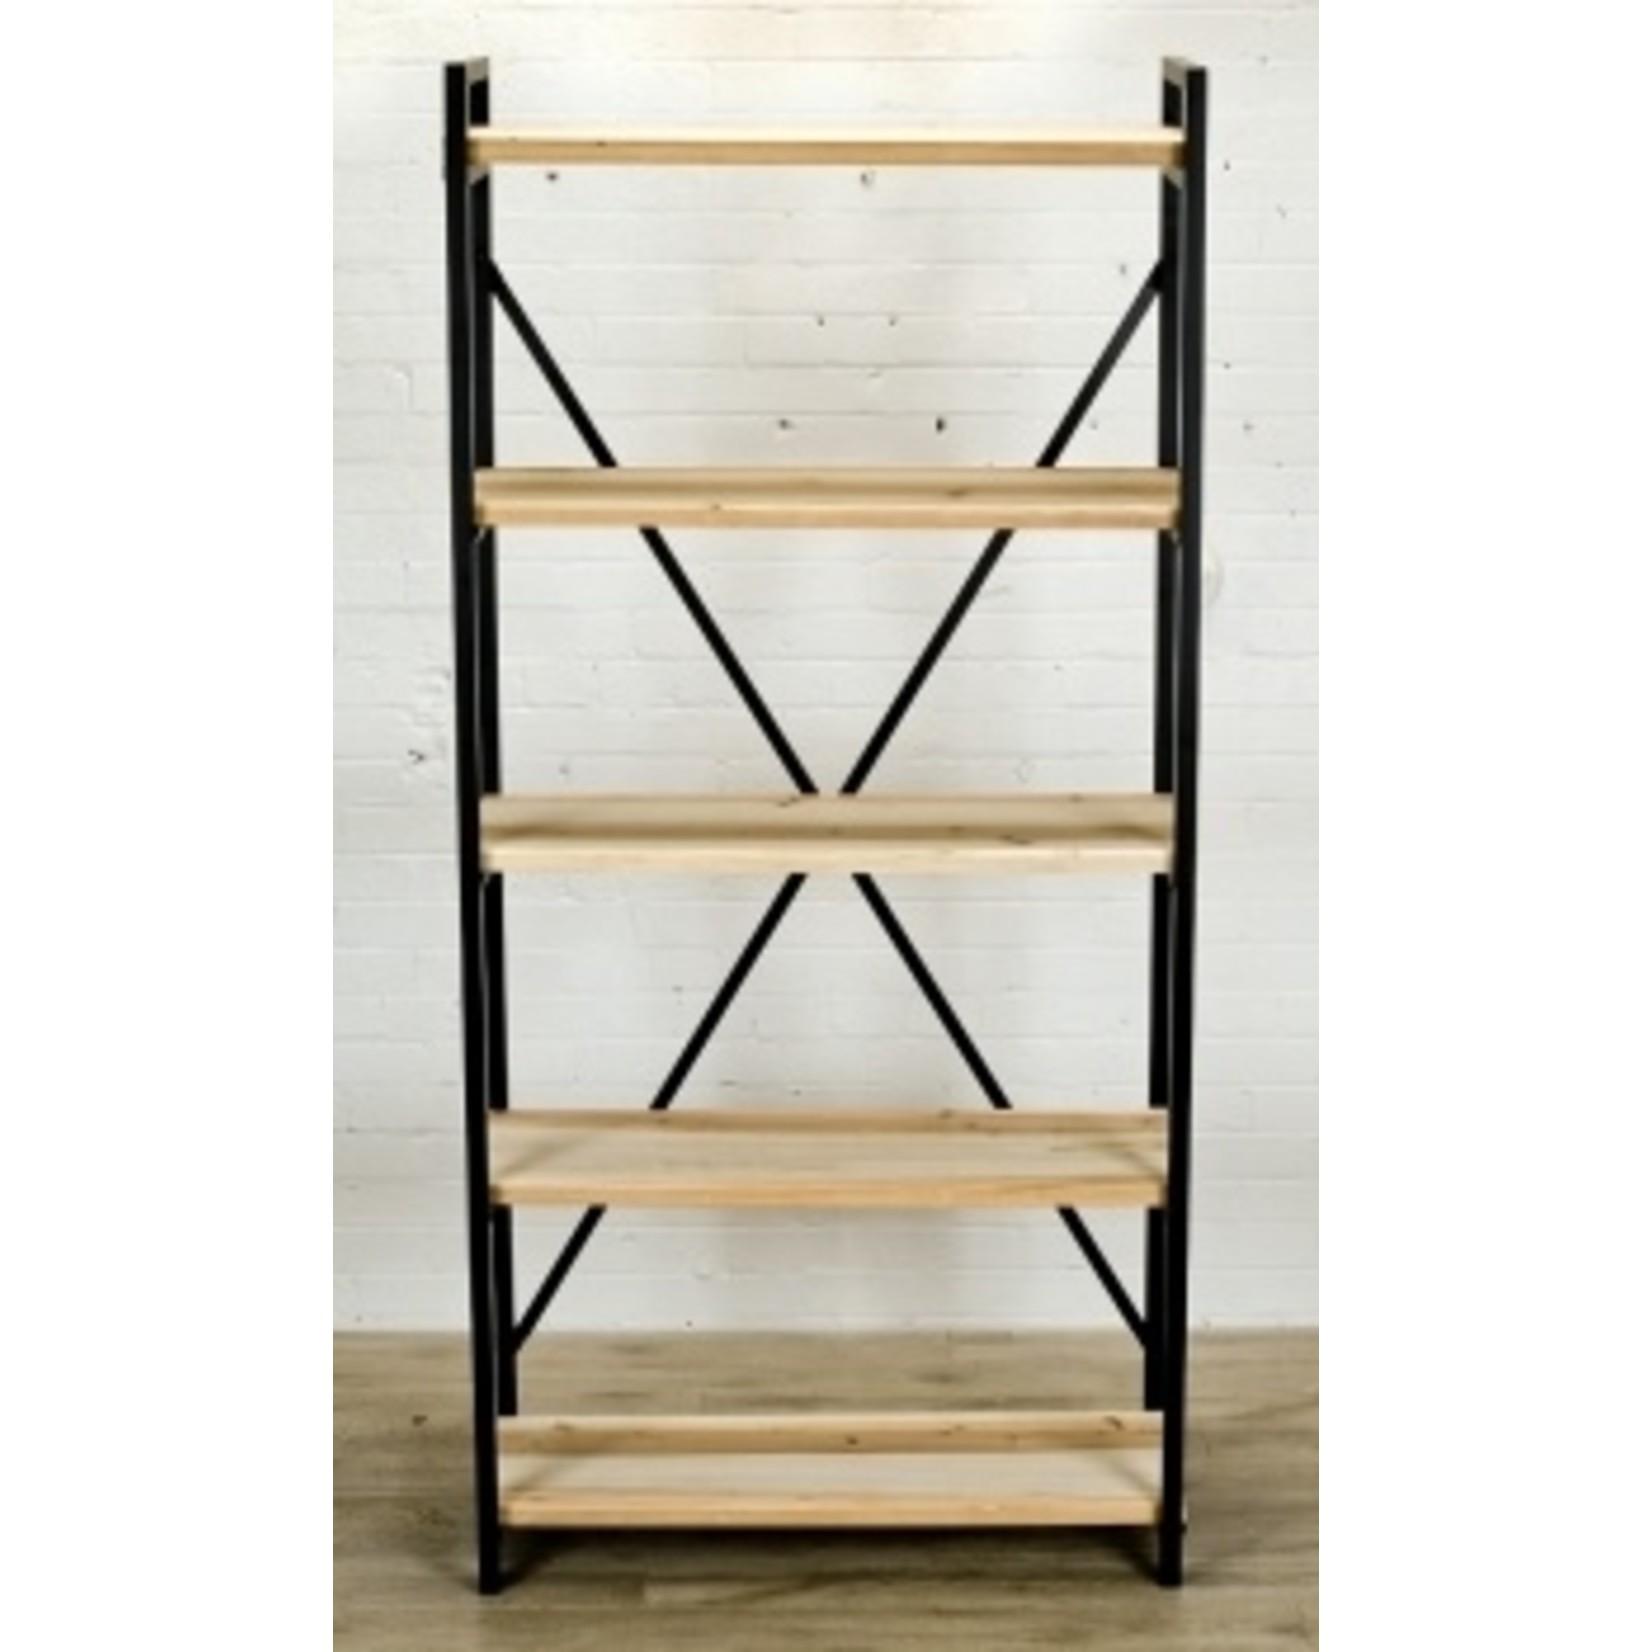 Iron & Wood Bookshelf